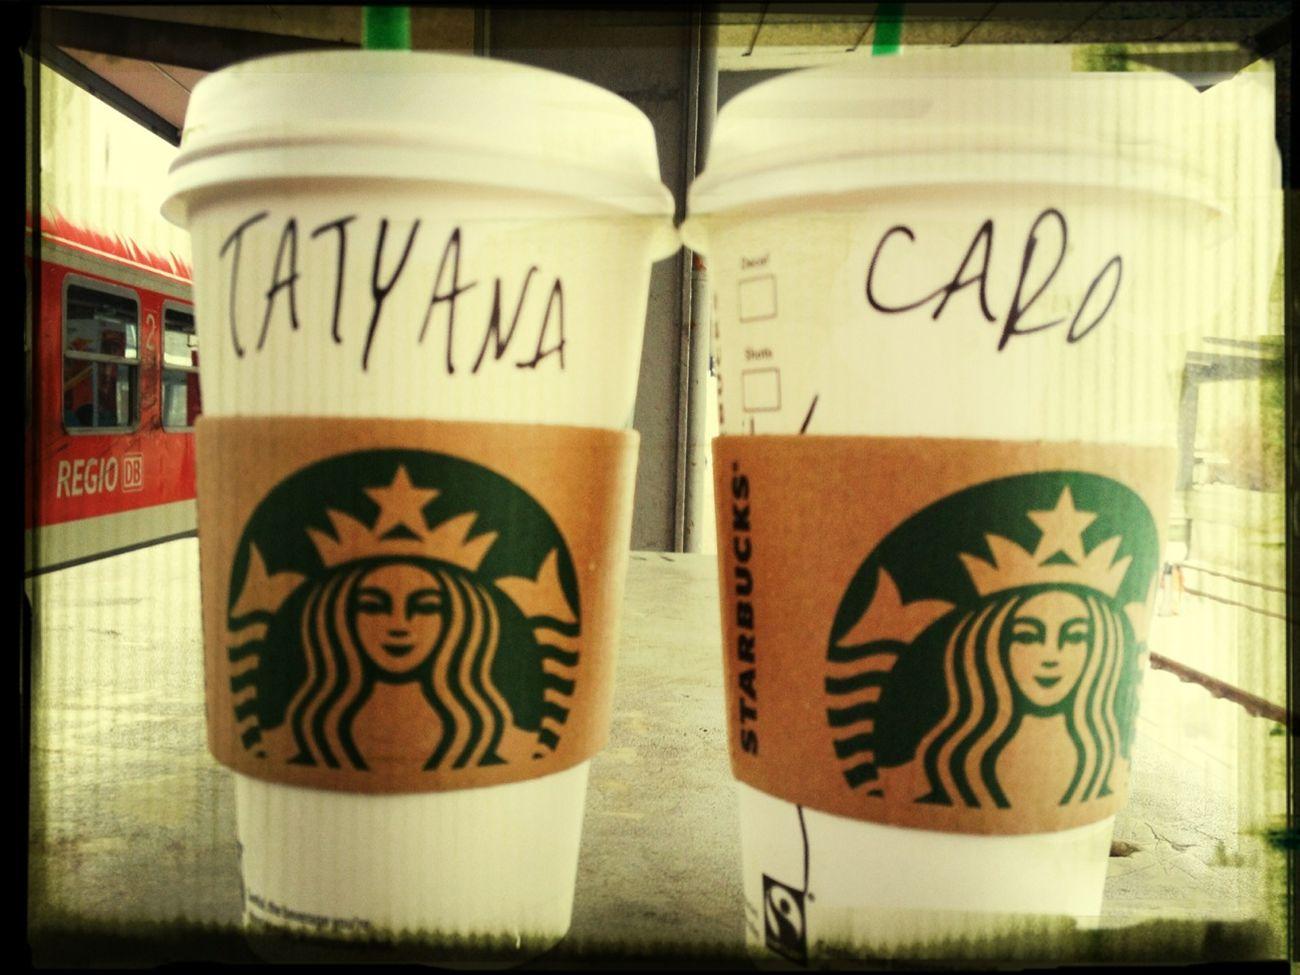 I ❤ Starbucks Vanilla Latte